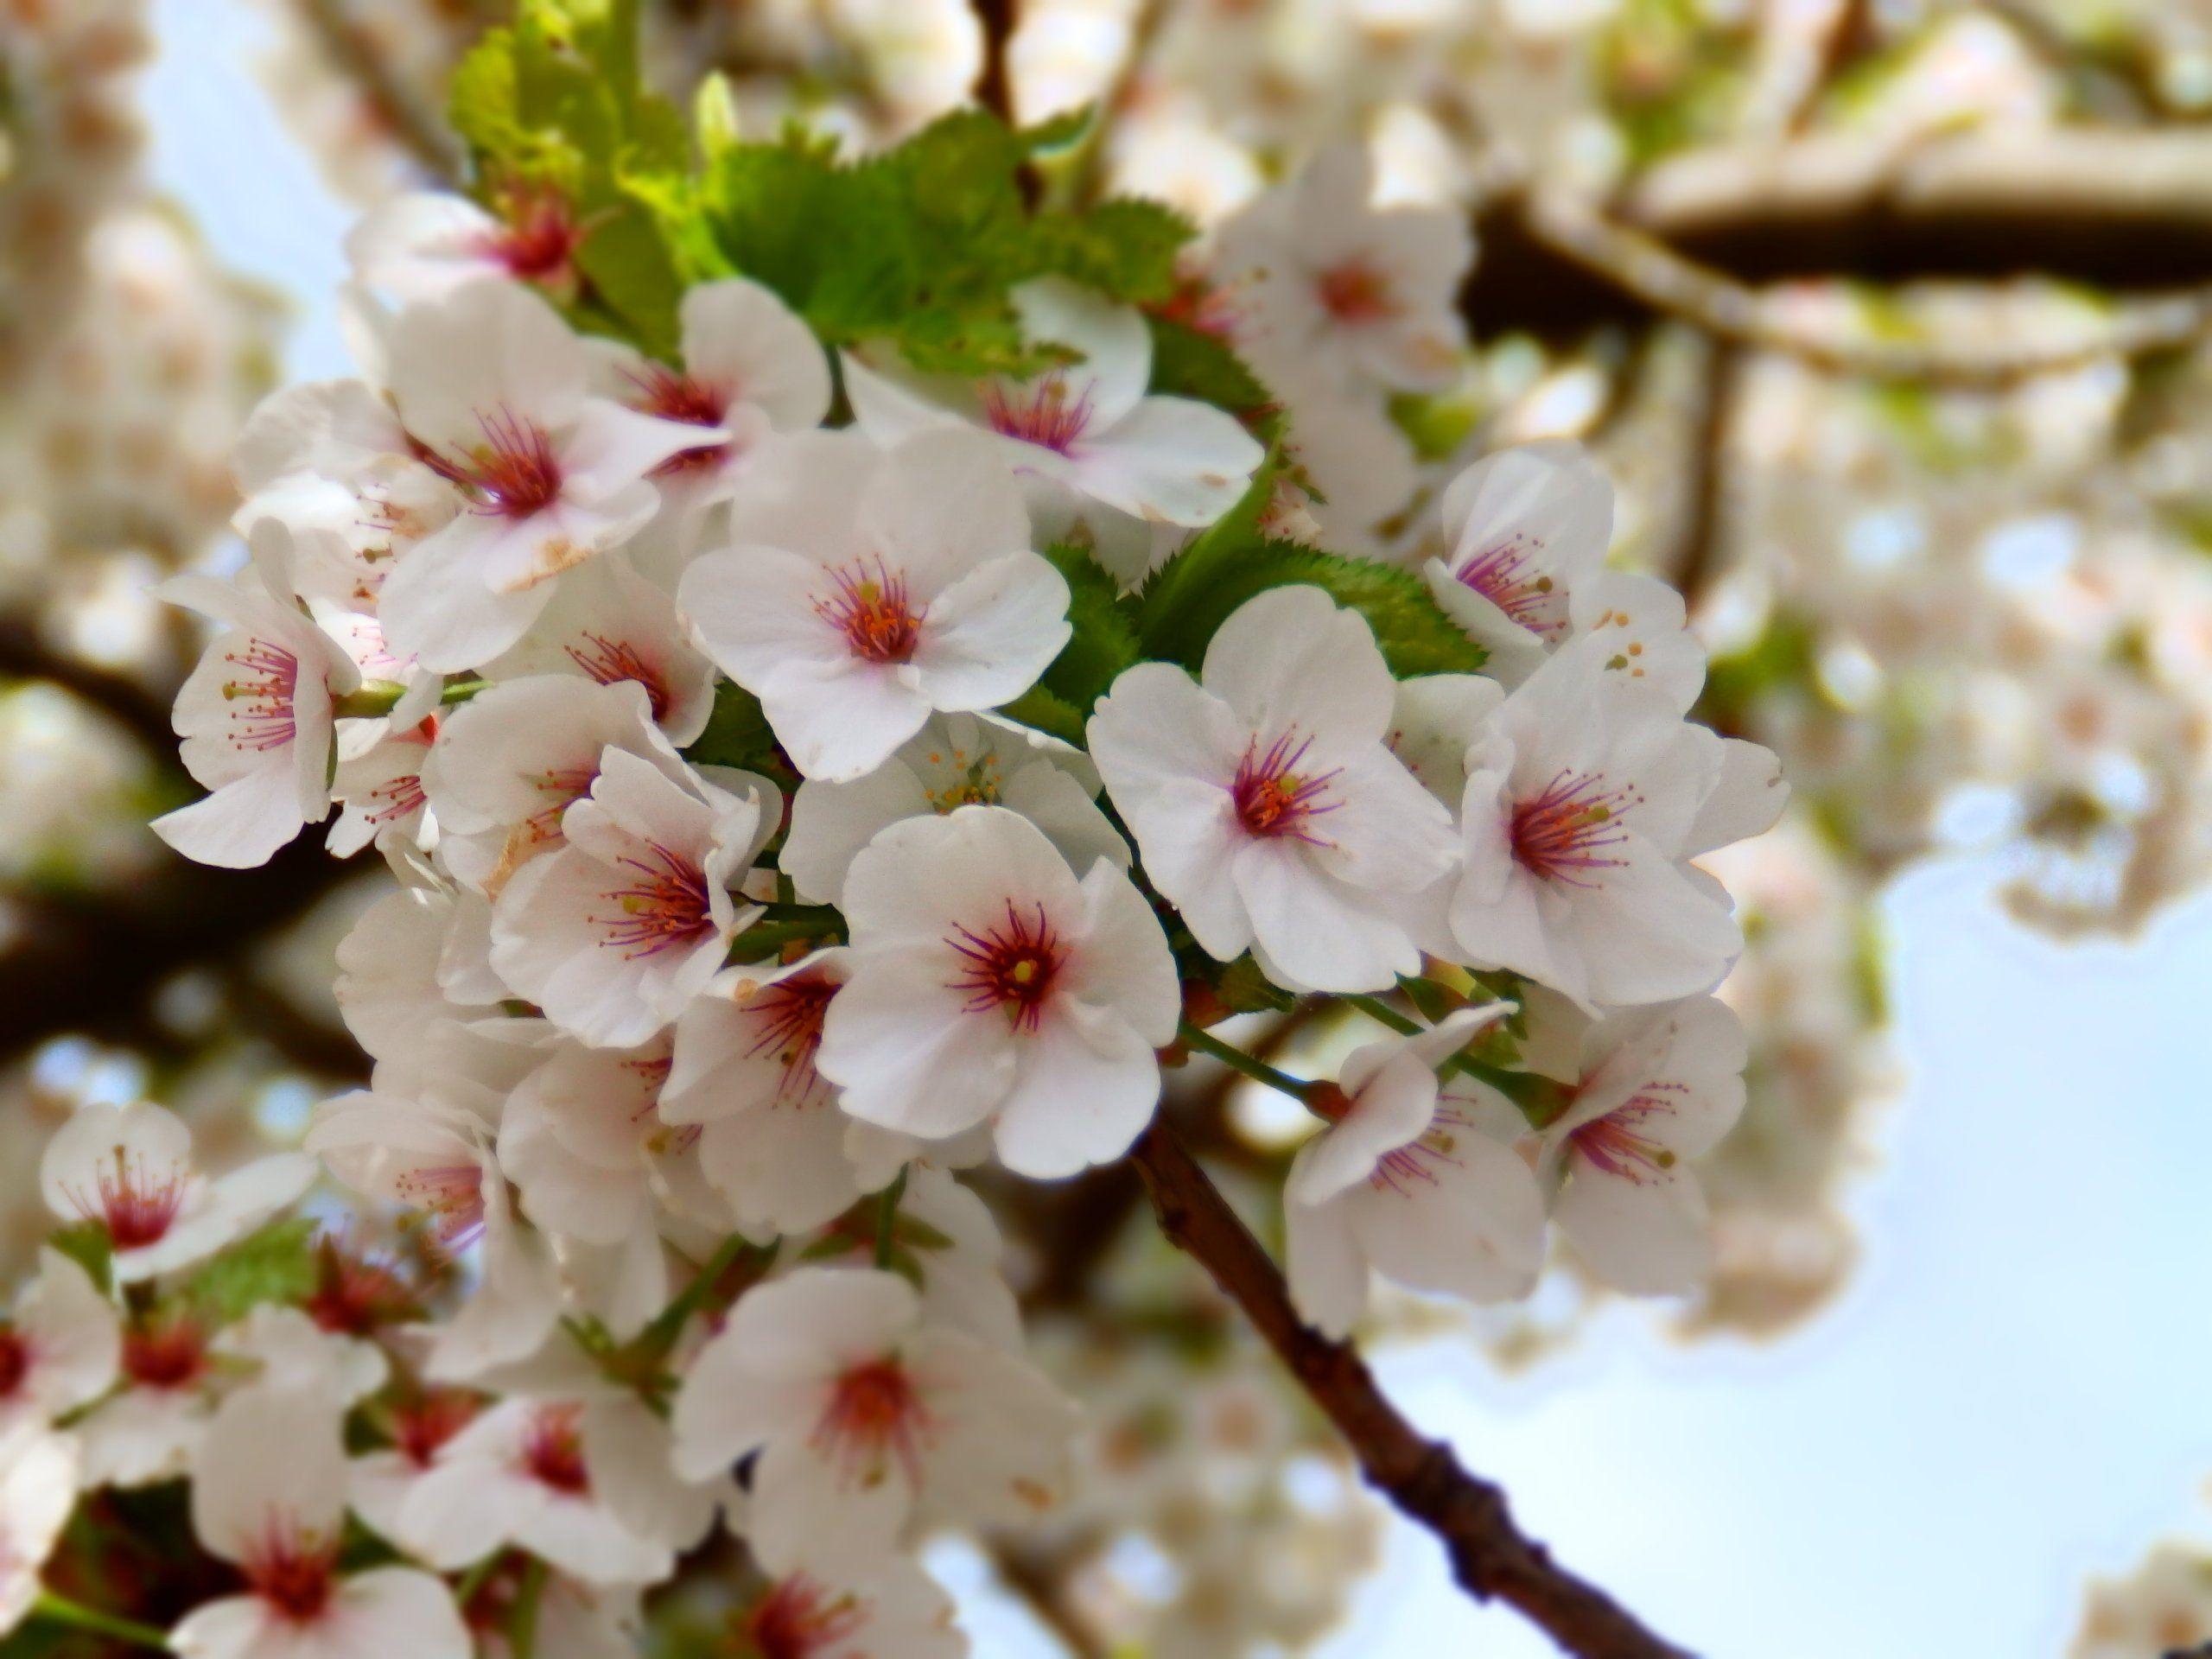 Cherry Blossom Tree White Flowers Wall Decor Canvas Photo Print Cherry Blossom Tree White Flowering Trees Blossom Trees